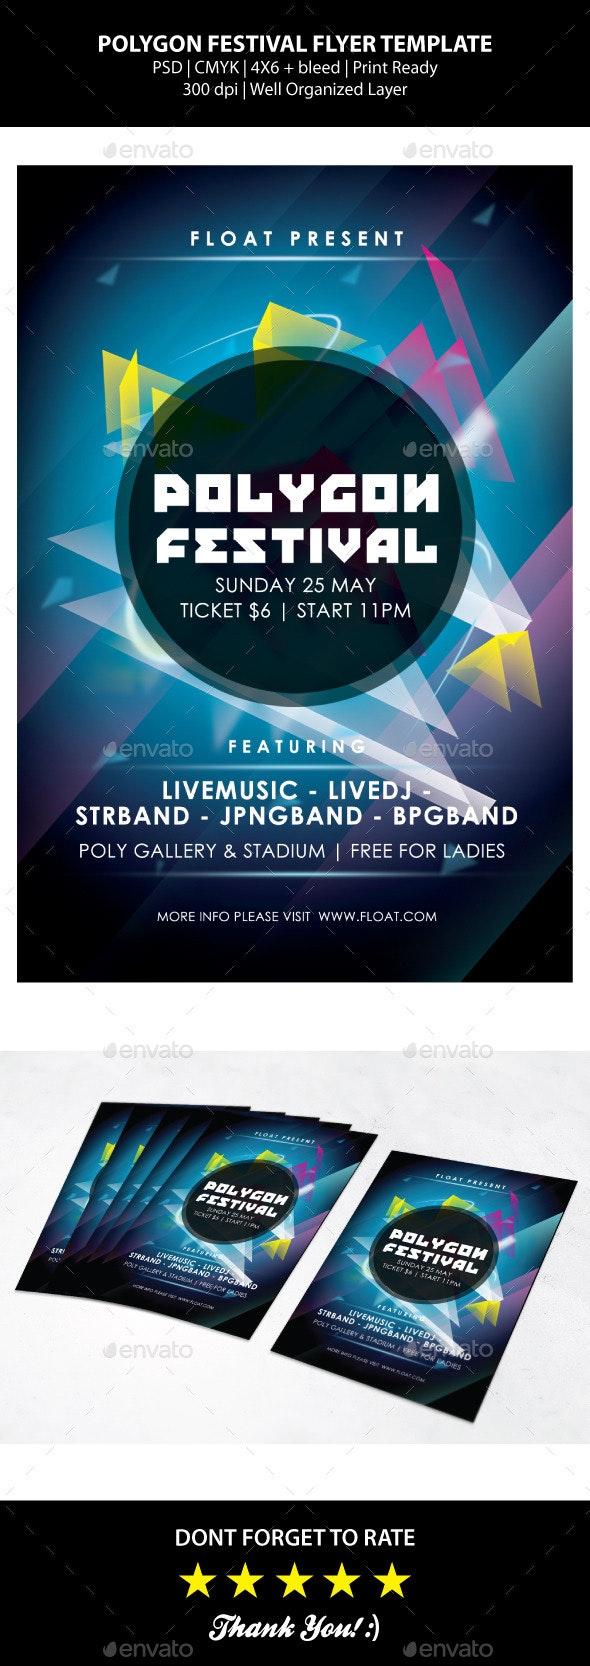 Polygon Festival Flyer Templates - Events Flyers